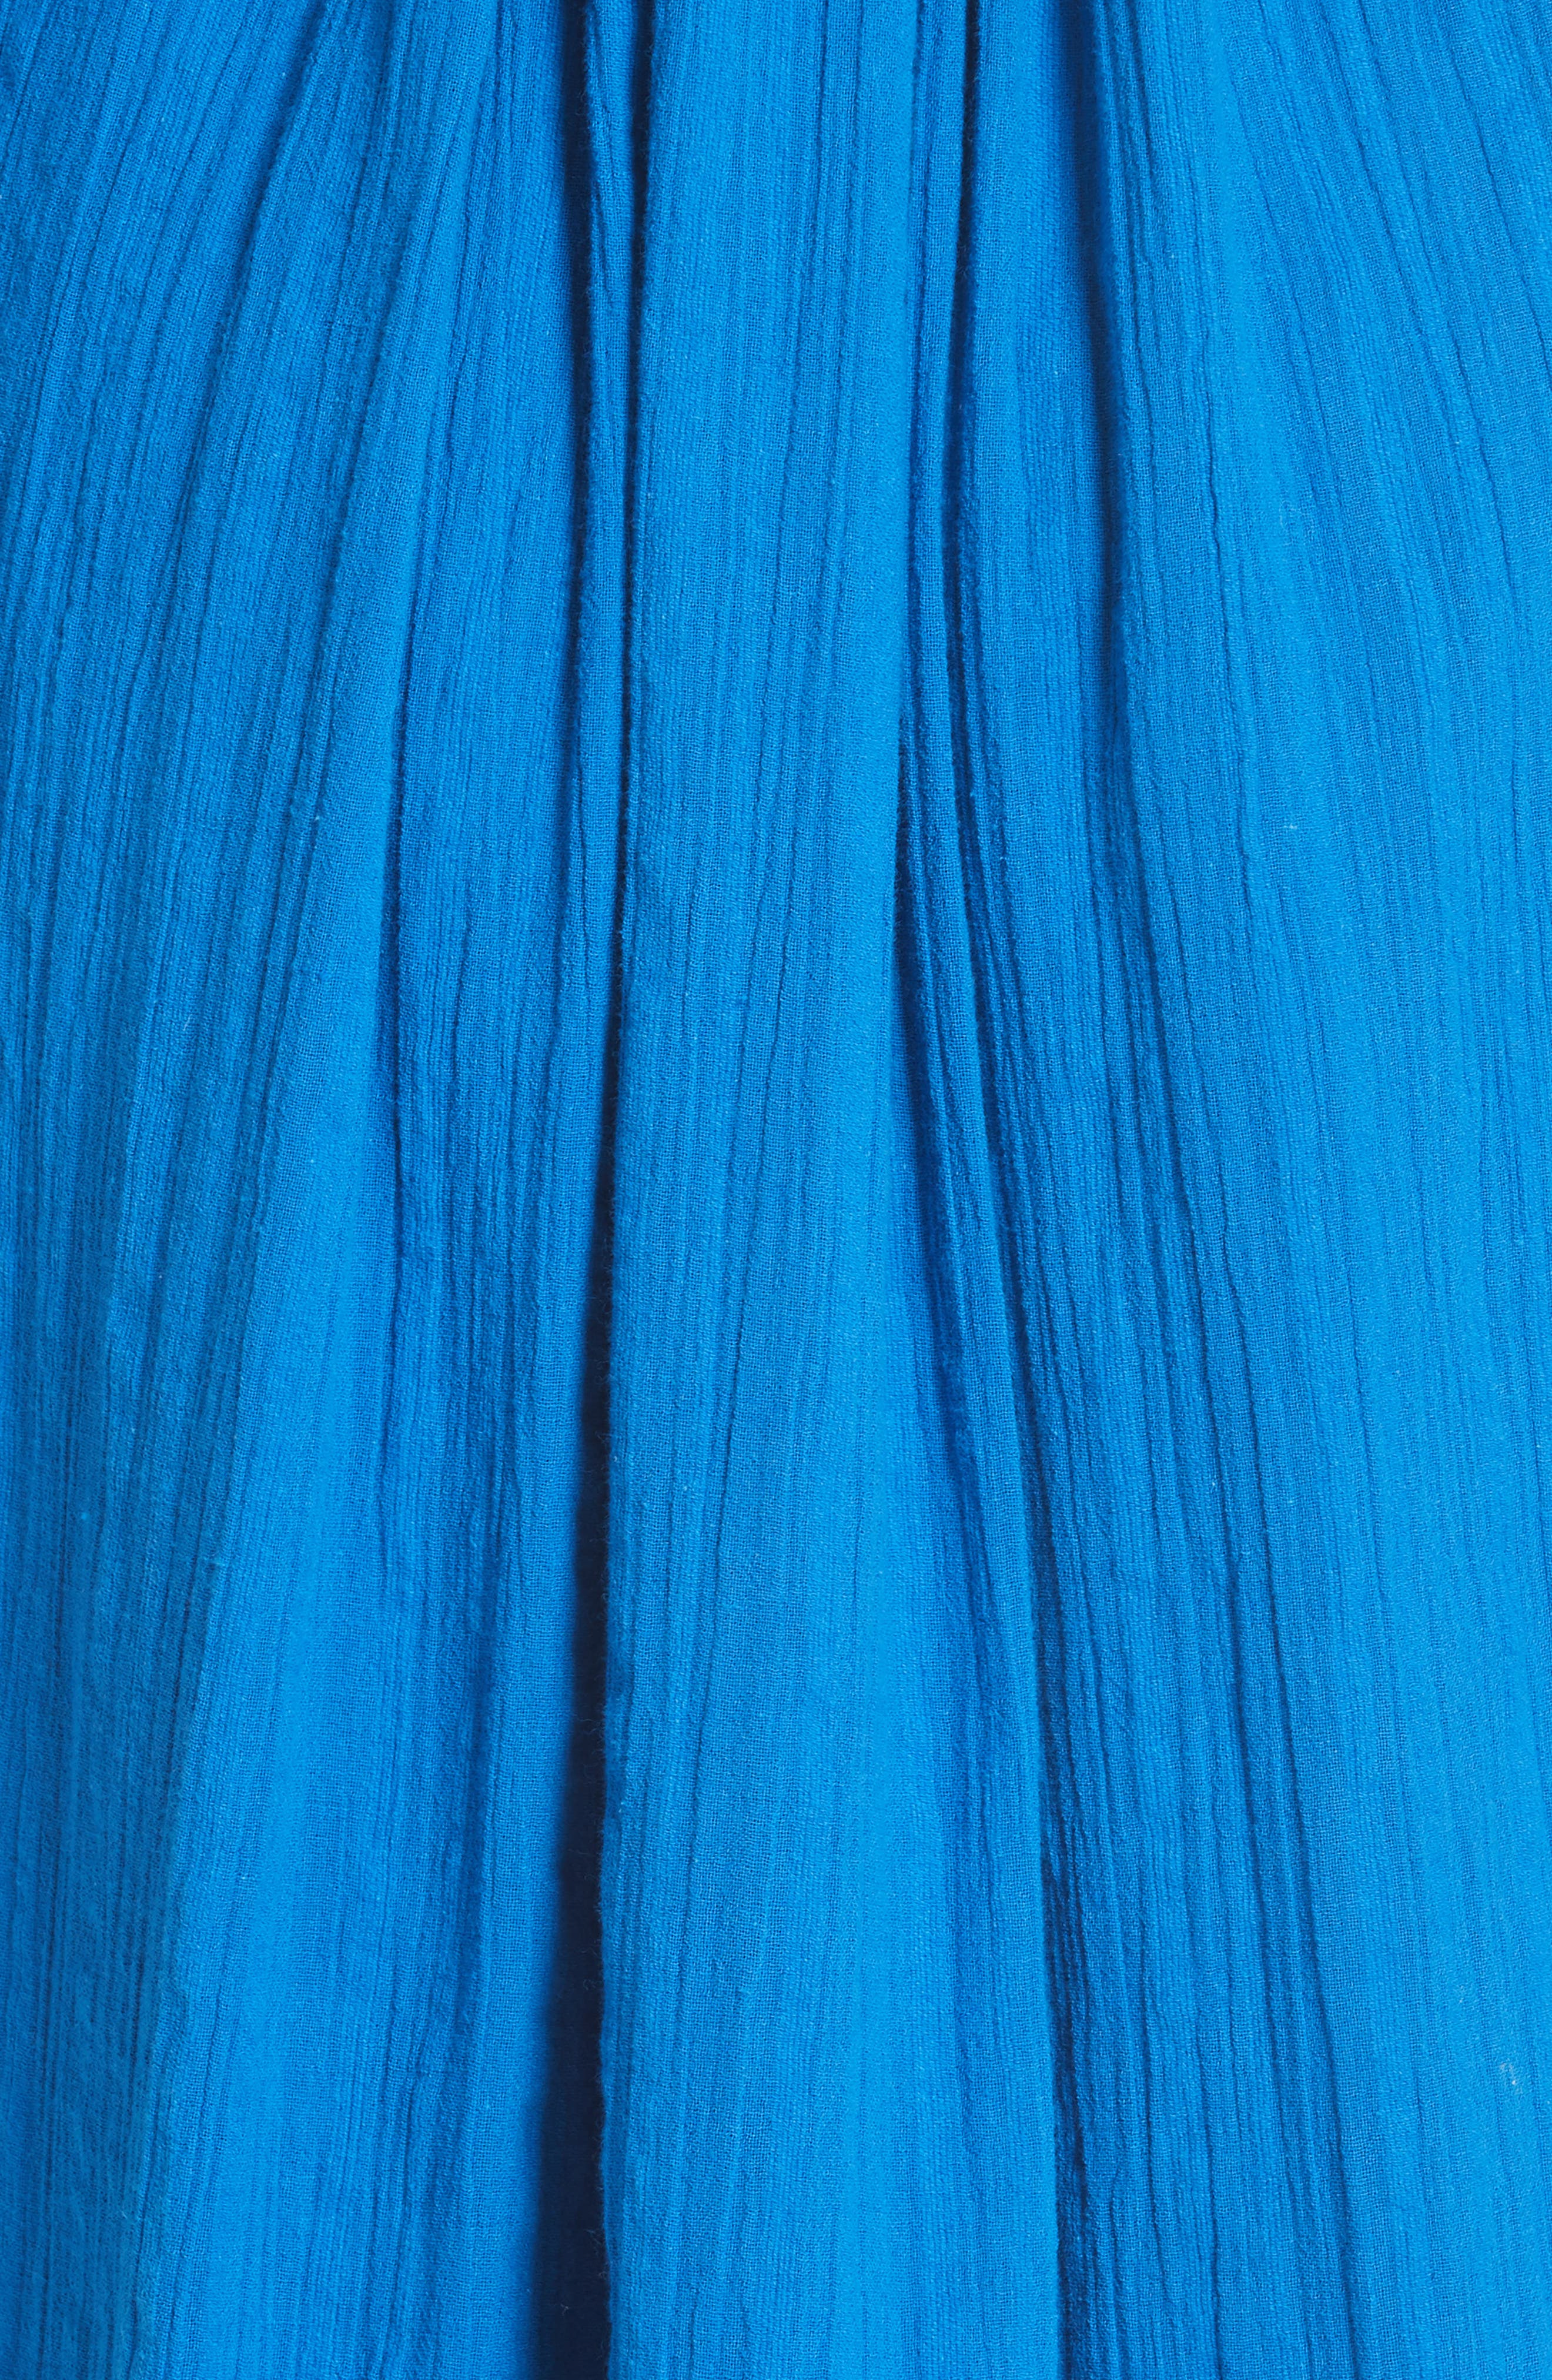 Filia Embroidered Midi Dress,                             Alternate thumbnail 5, color,                             Cobalt